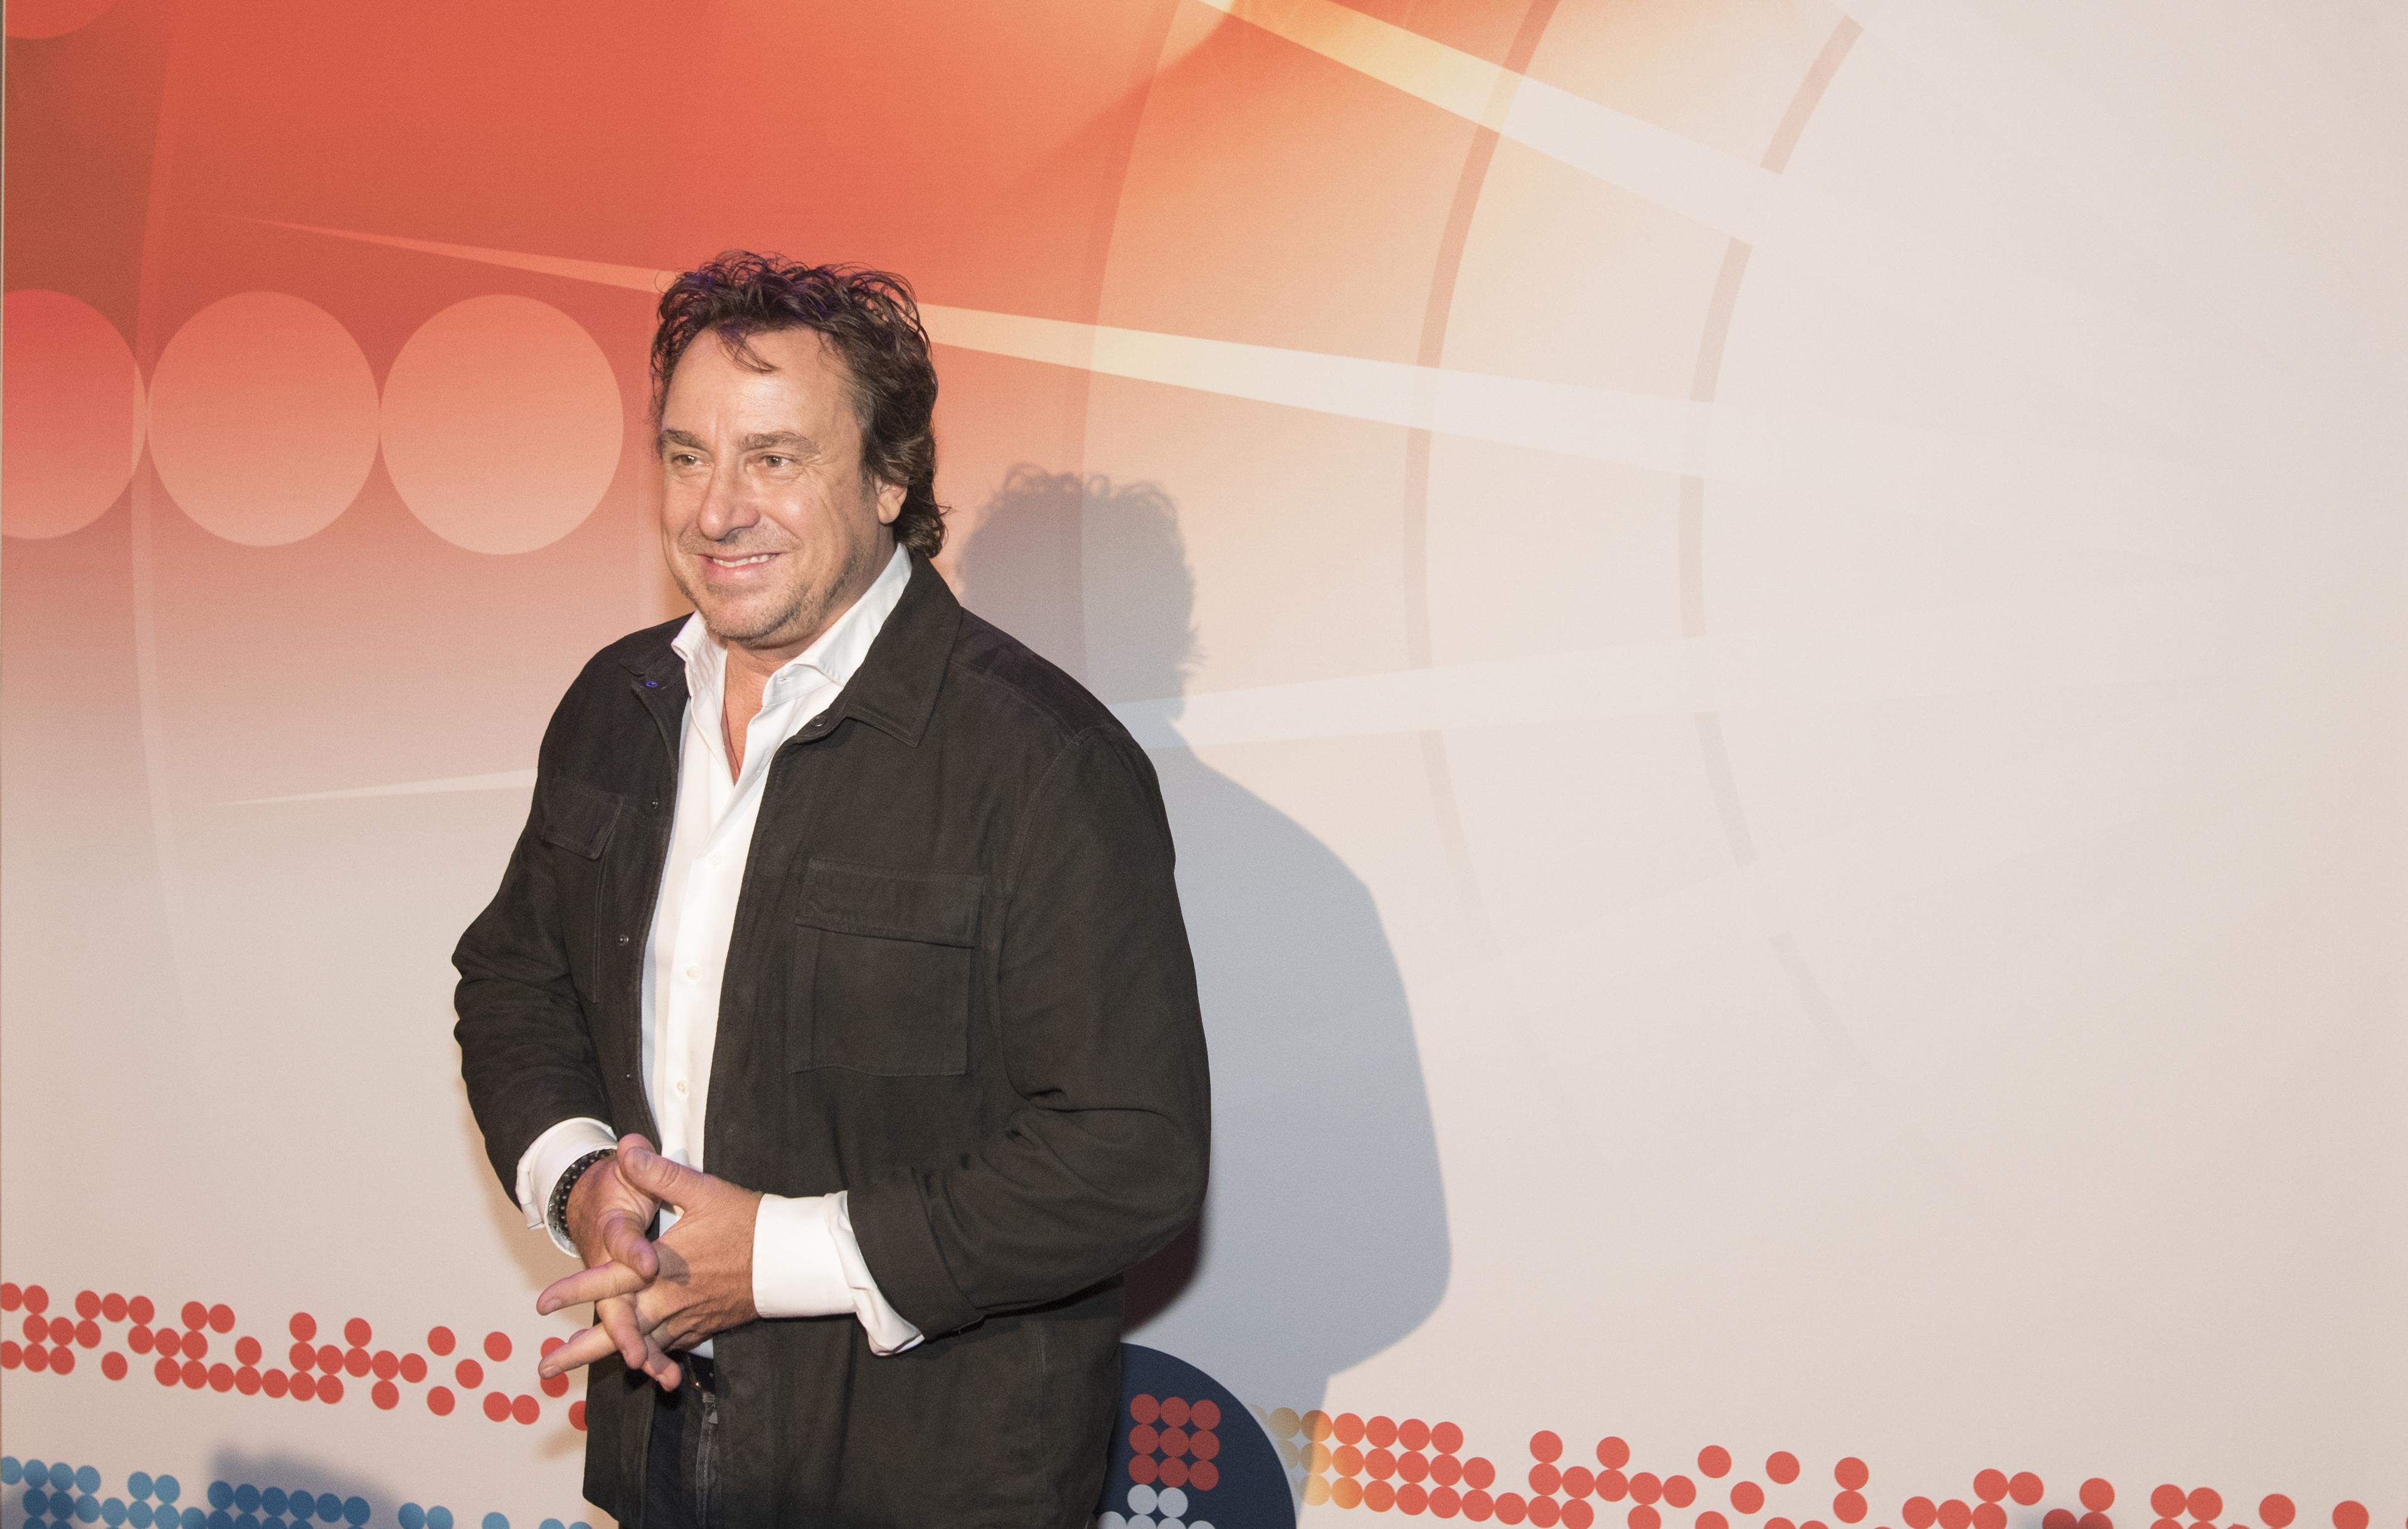 Marco Borsato tijdens Buma NL Awards 2017 - Fotocredits: Shali Blok (ArtiestenNieuws)